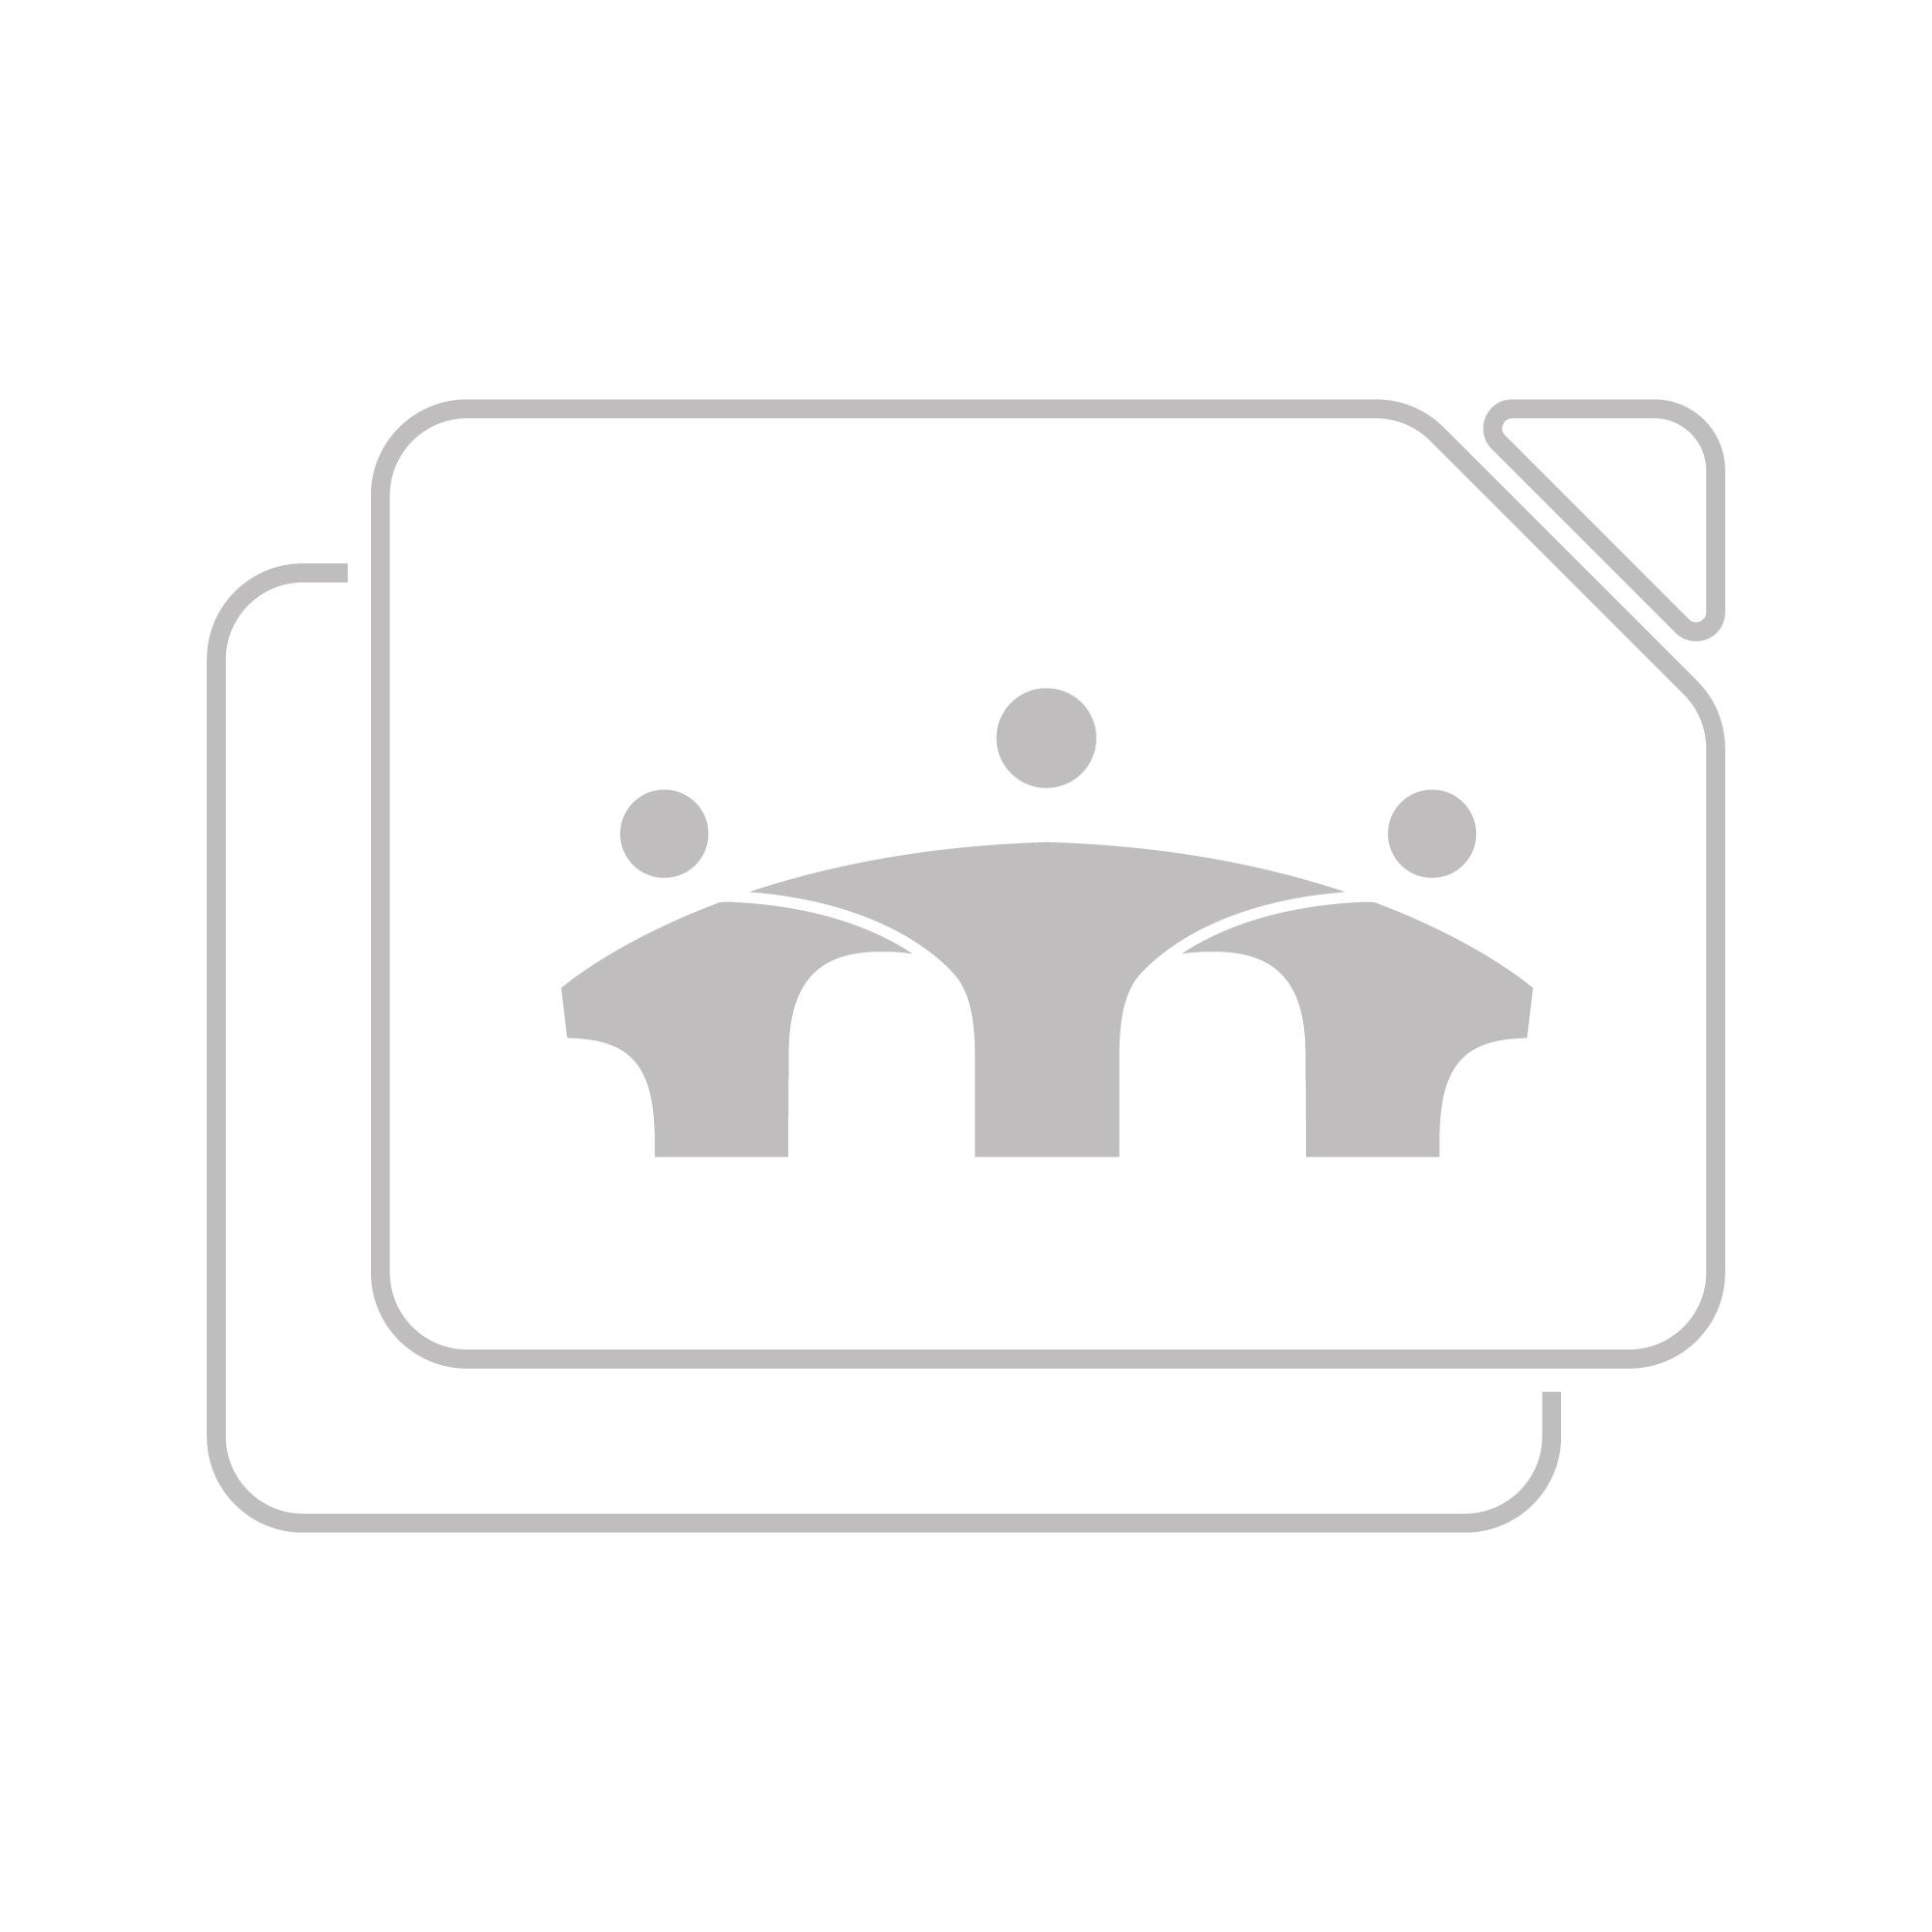 Logitech K380 for Mac Multi-Device Bluetooth Keyboard - ROSE - DEU - CENTRAL